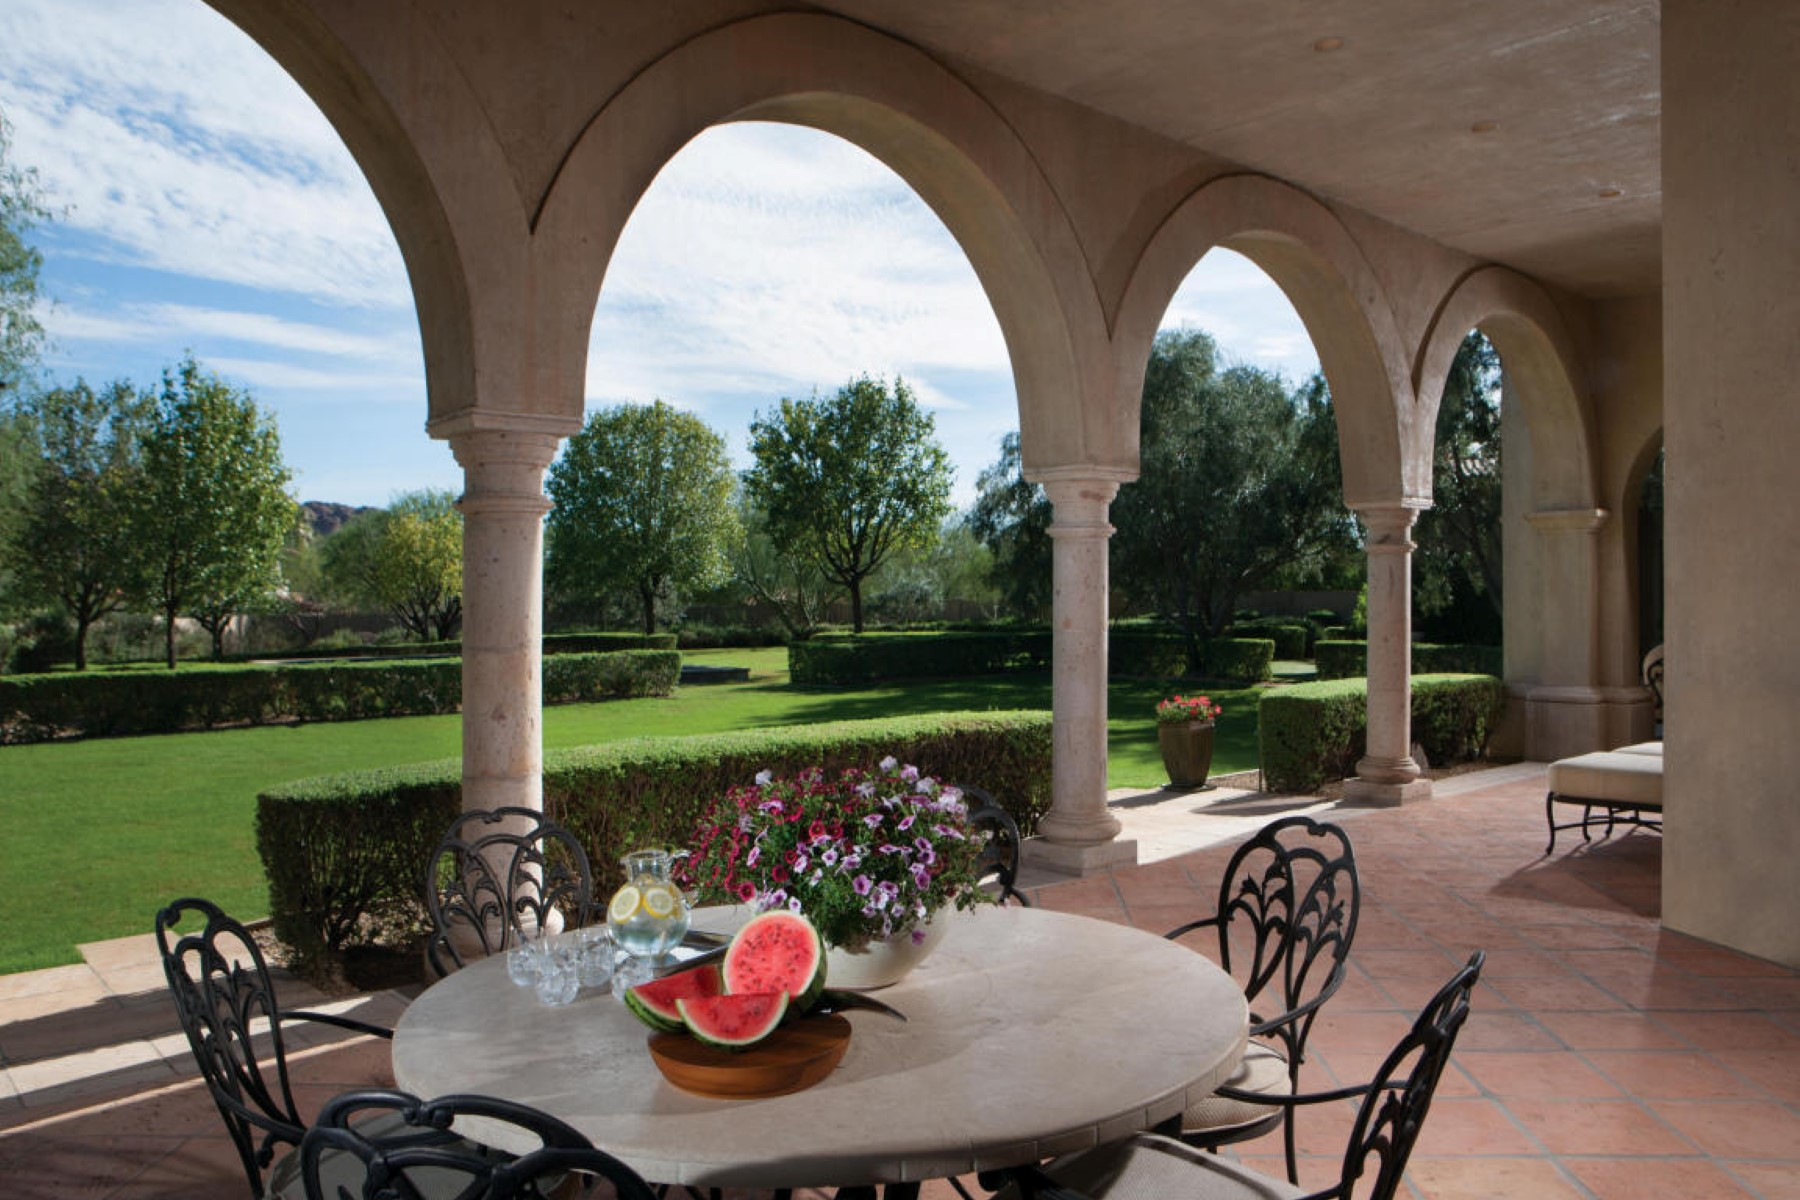 Villa per Vendita alle ore Paradise Valley's geologic crown jewel 4635 E Ocotillo Rd Paradise Valley, Arizona, 85253 Stati Uniti